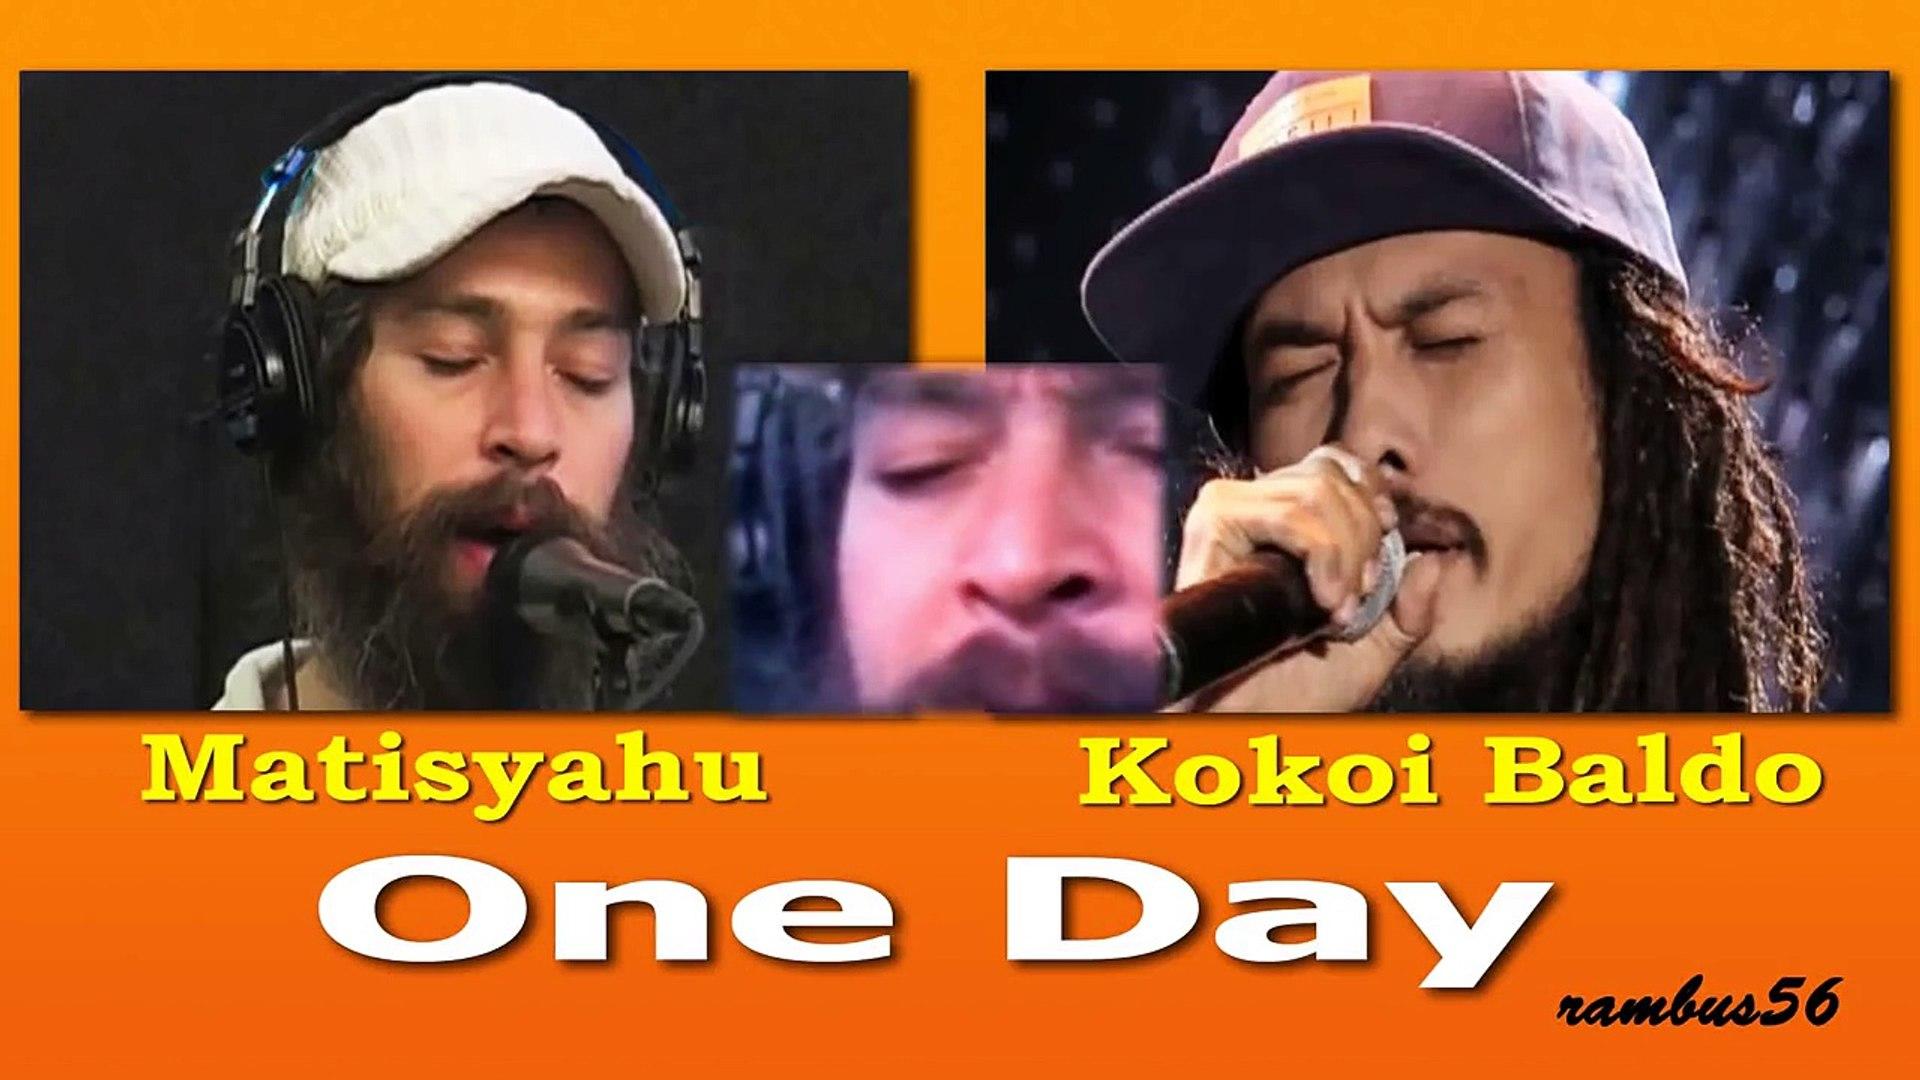 KOKOI BALDO The Voice PH covers ONE DAY by MATISYAHU